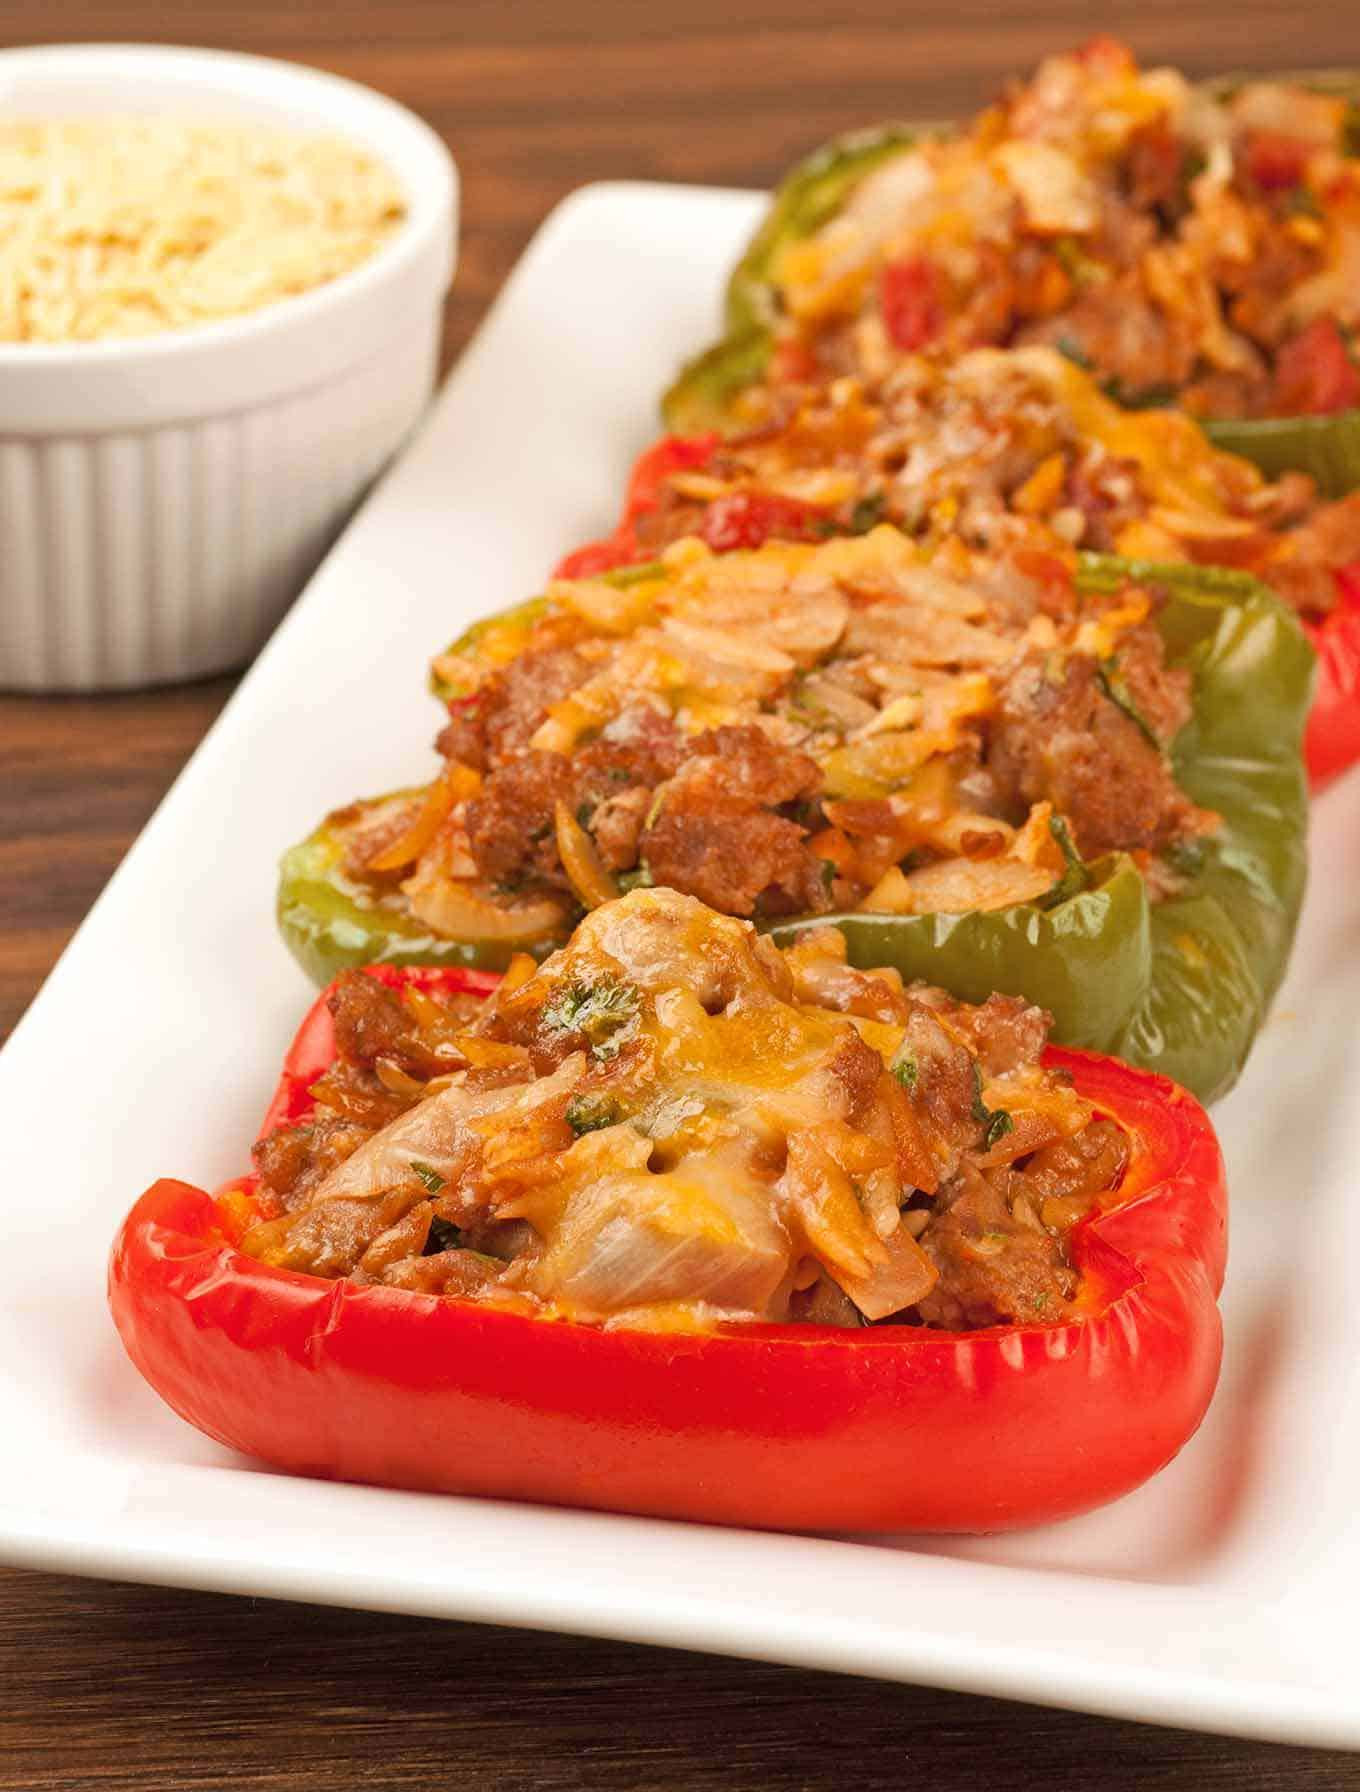 Turkey Sausage Recipes  Turkey Sausage and Orzo Stuffed Peppers Recipe